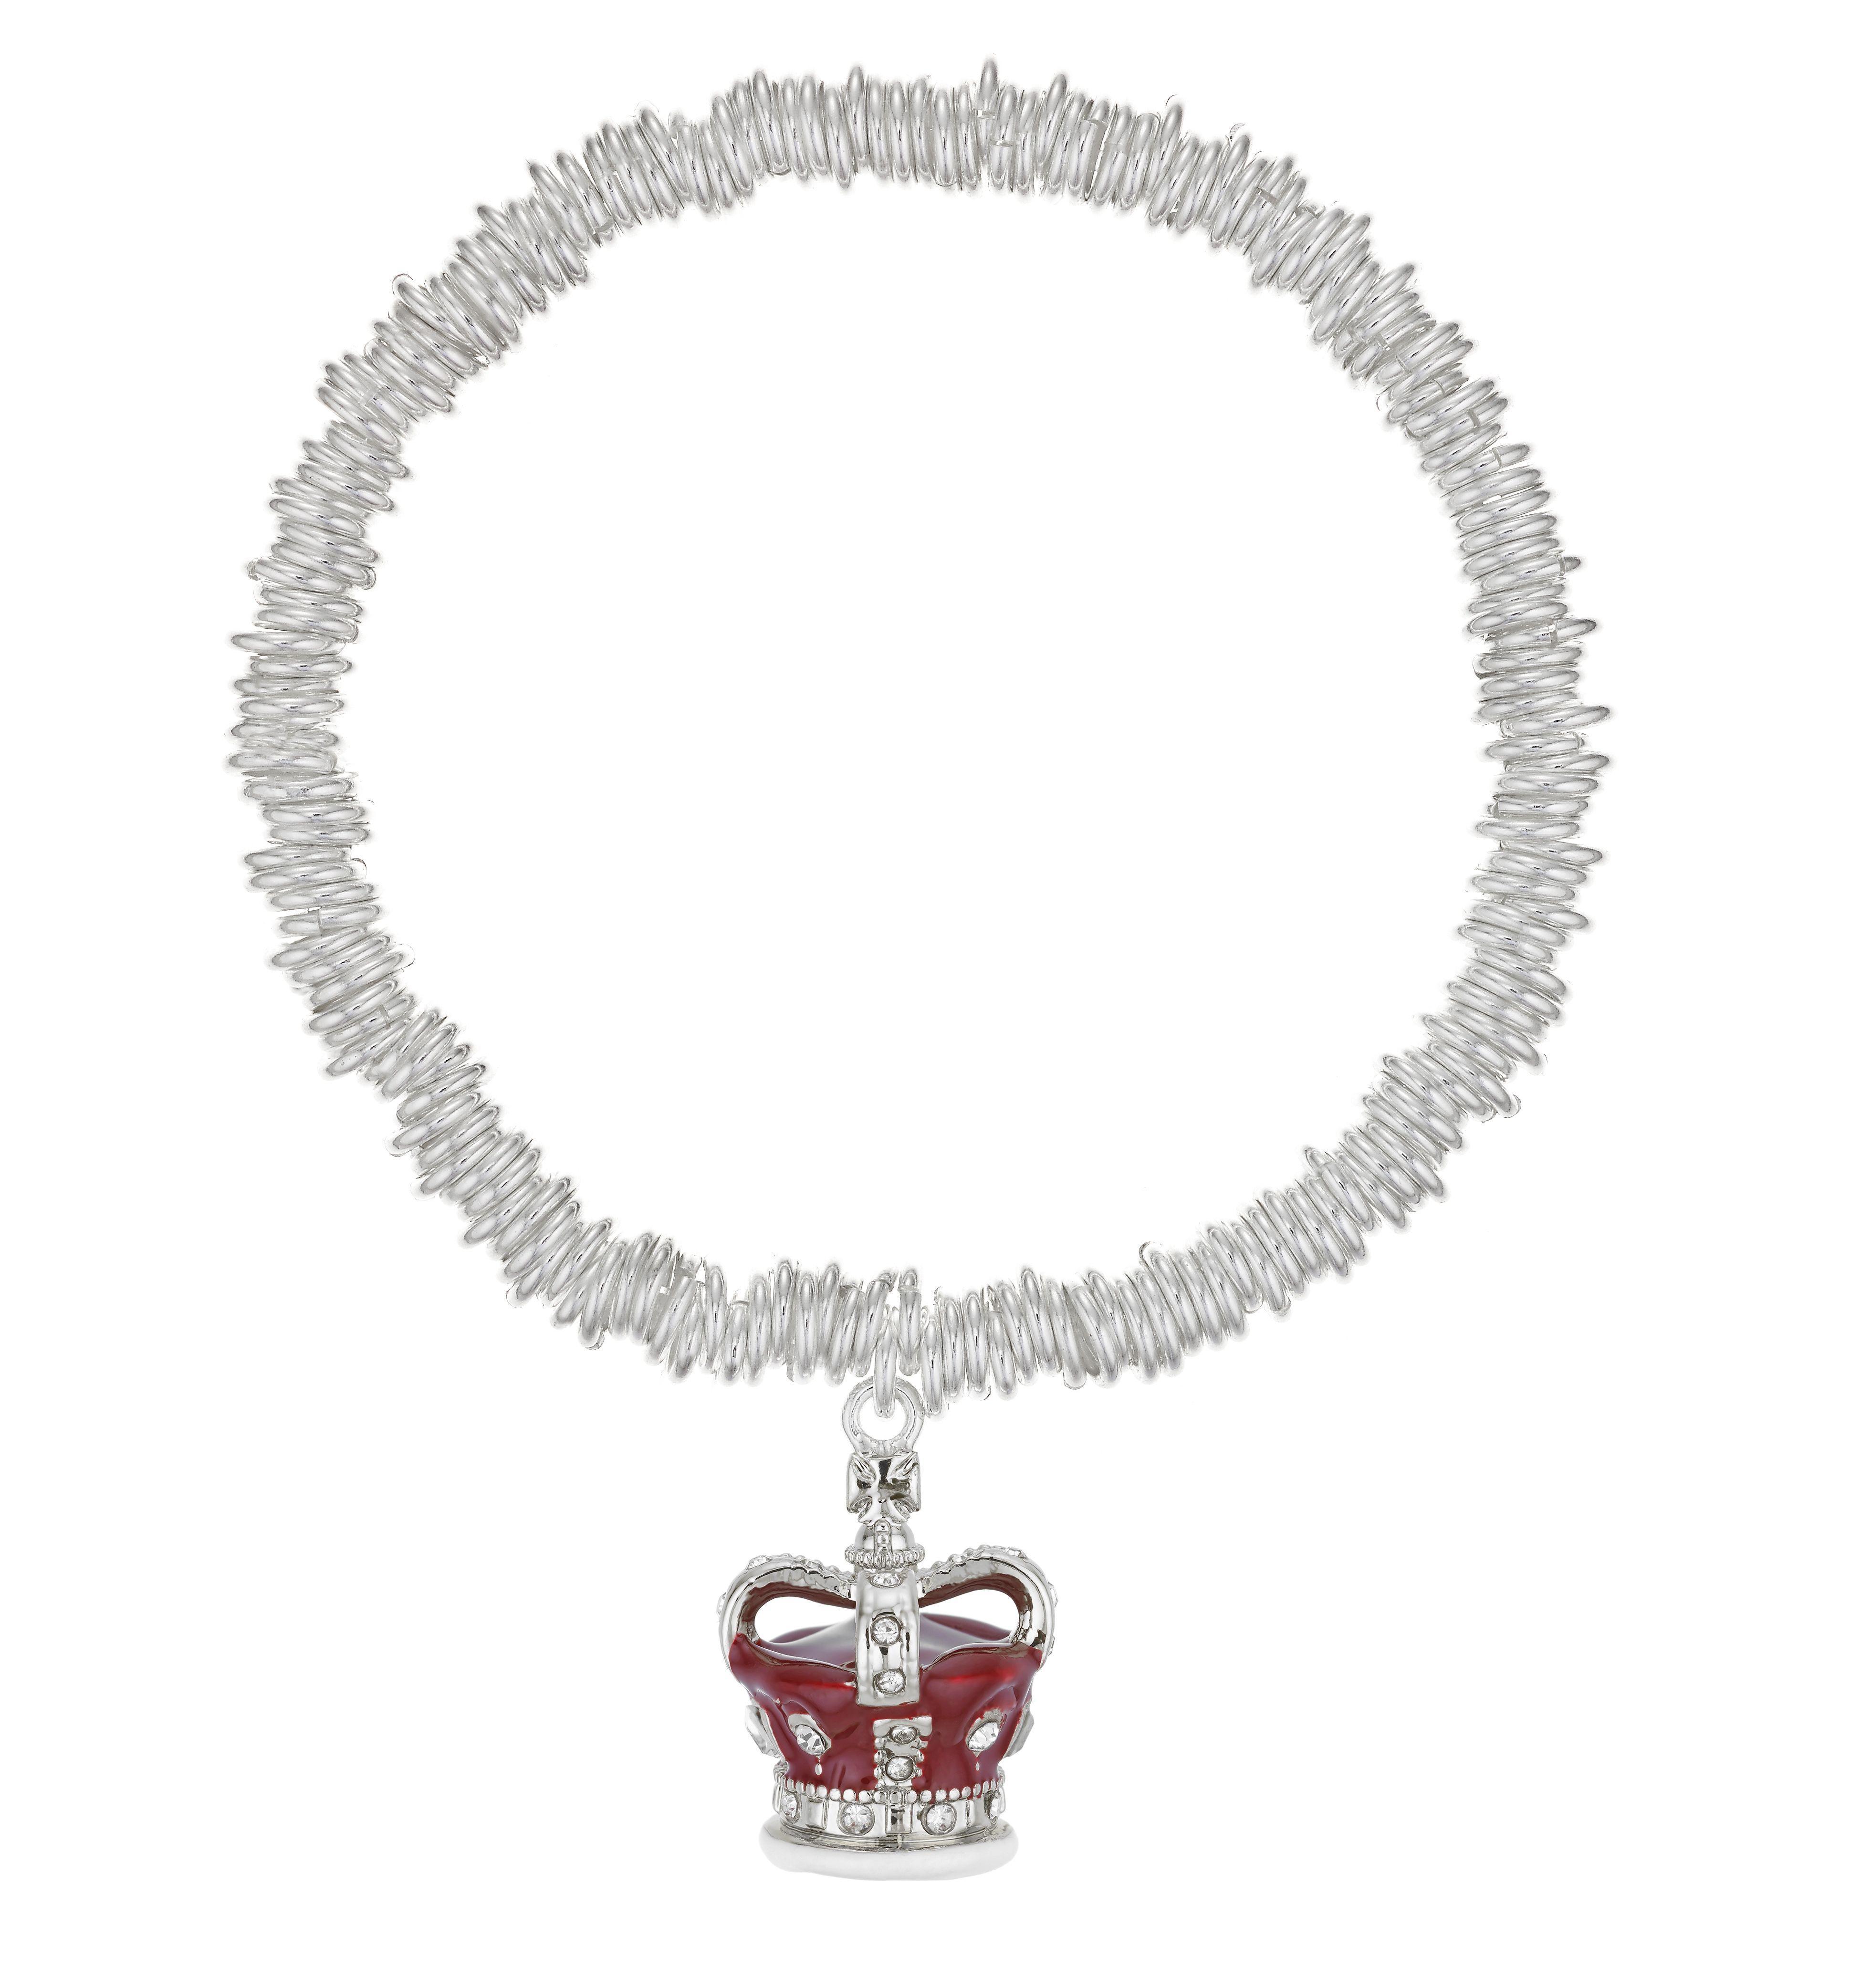 Buckley London Royal Crown Charm Bracelet